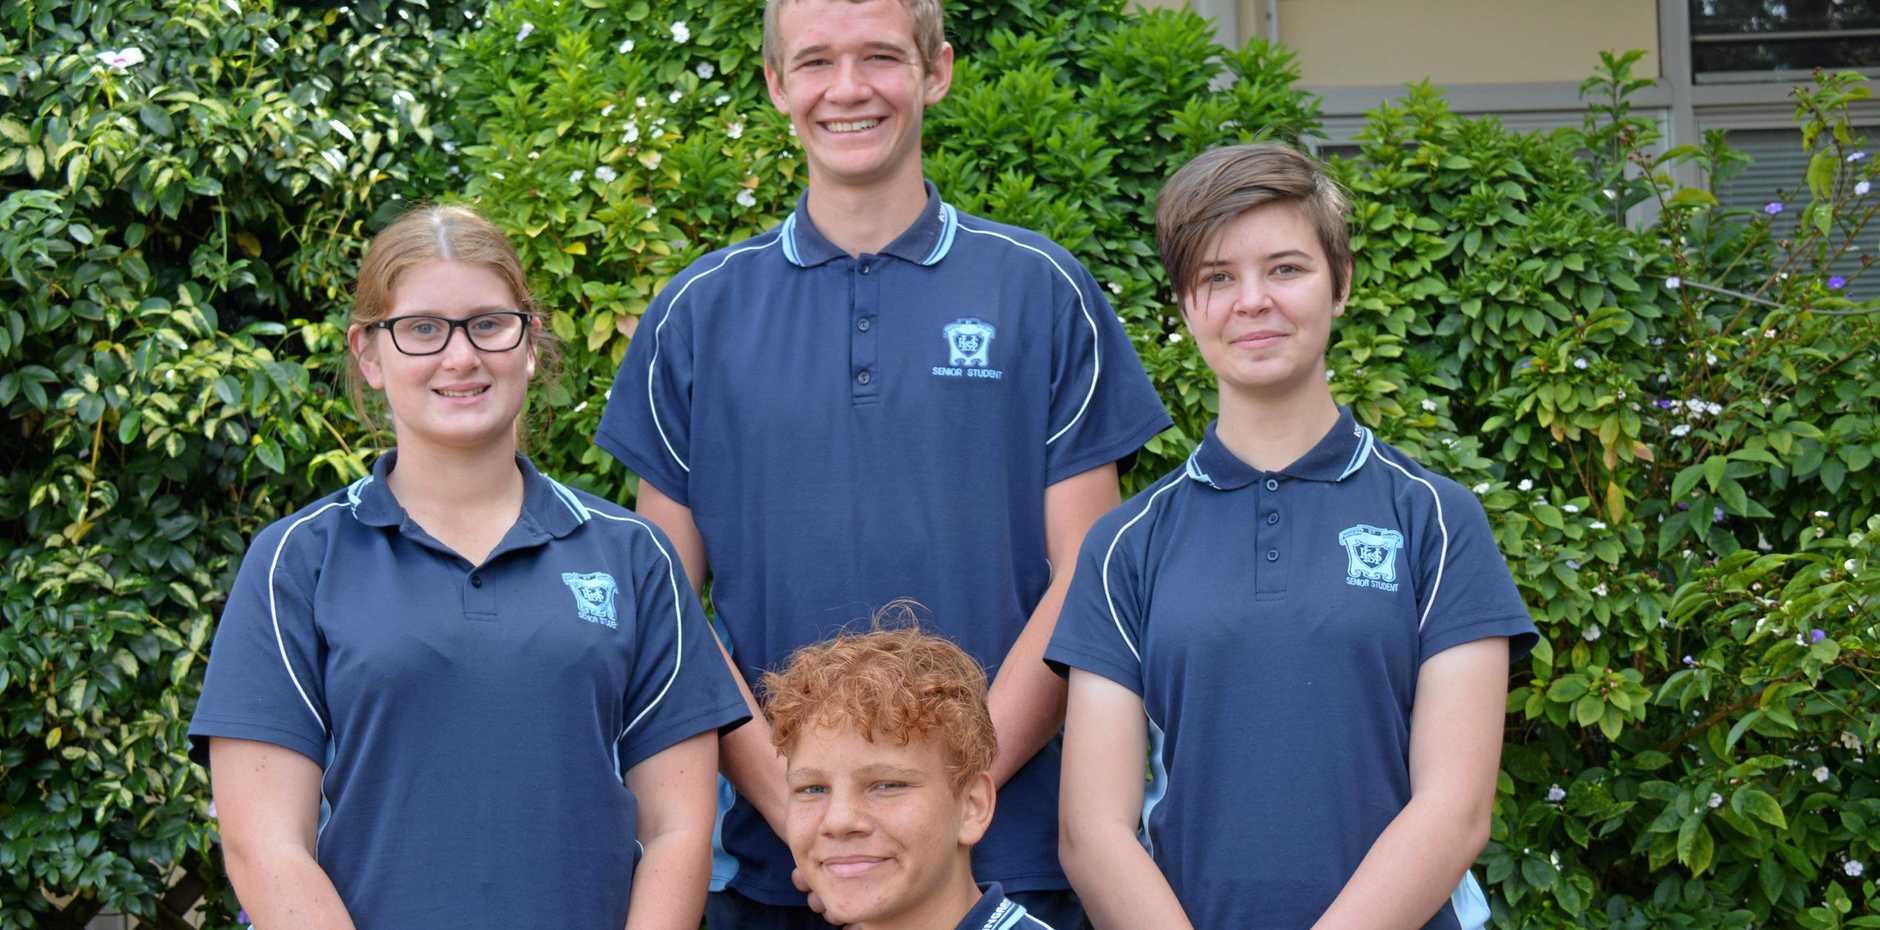 Kingaroy State High School students Trinity Rose, Ian Nicholson, Larna Buckle, and Nicholas Hume.